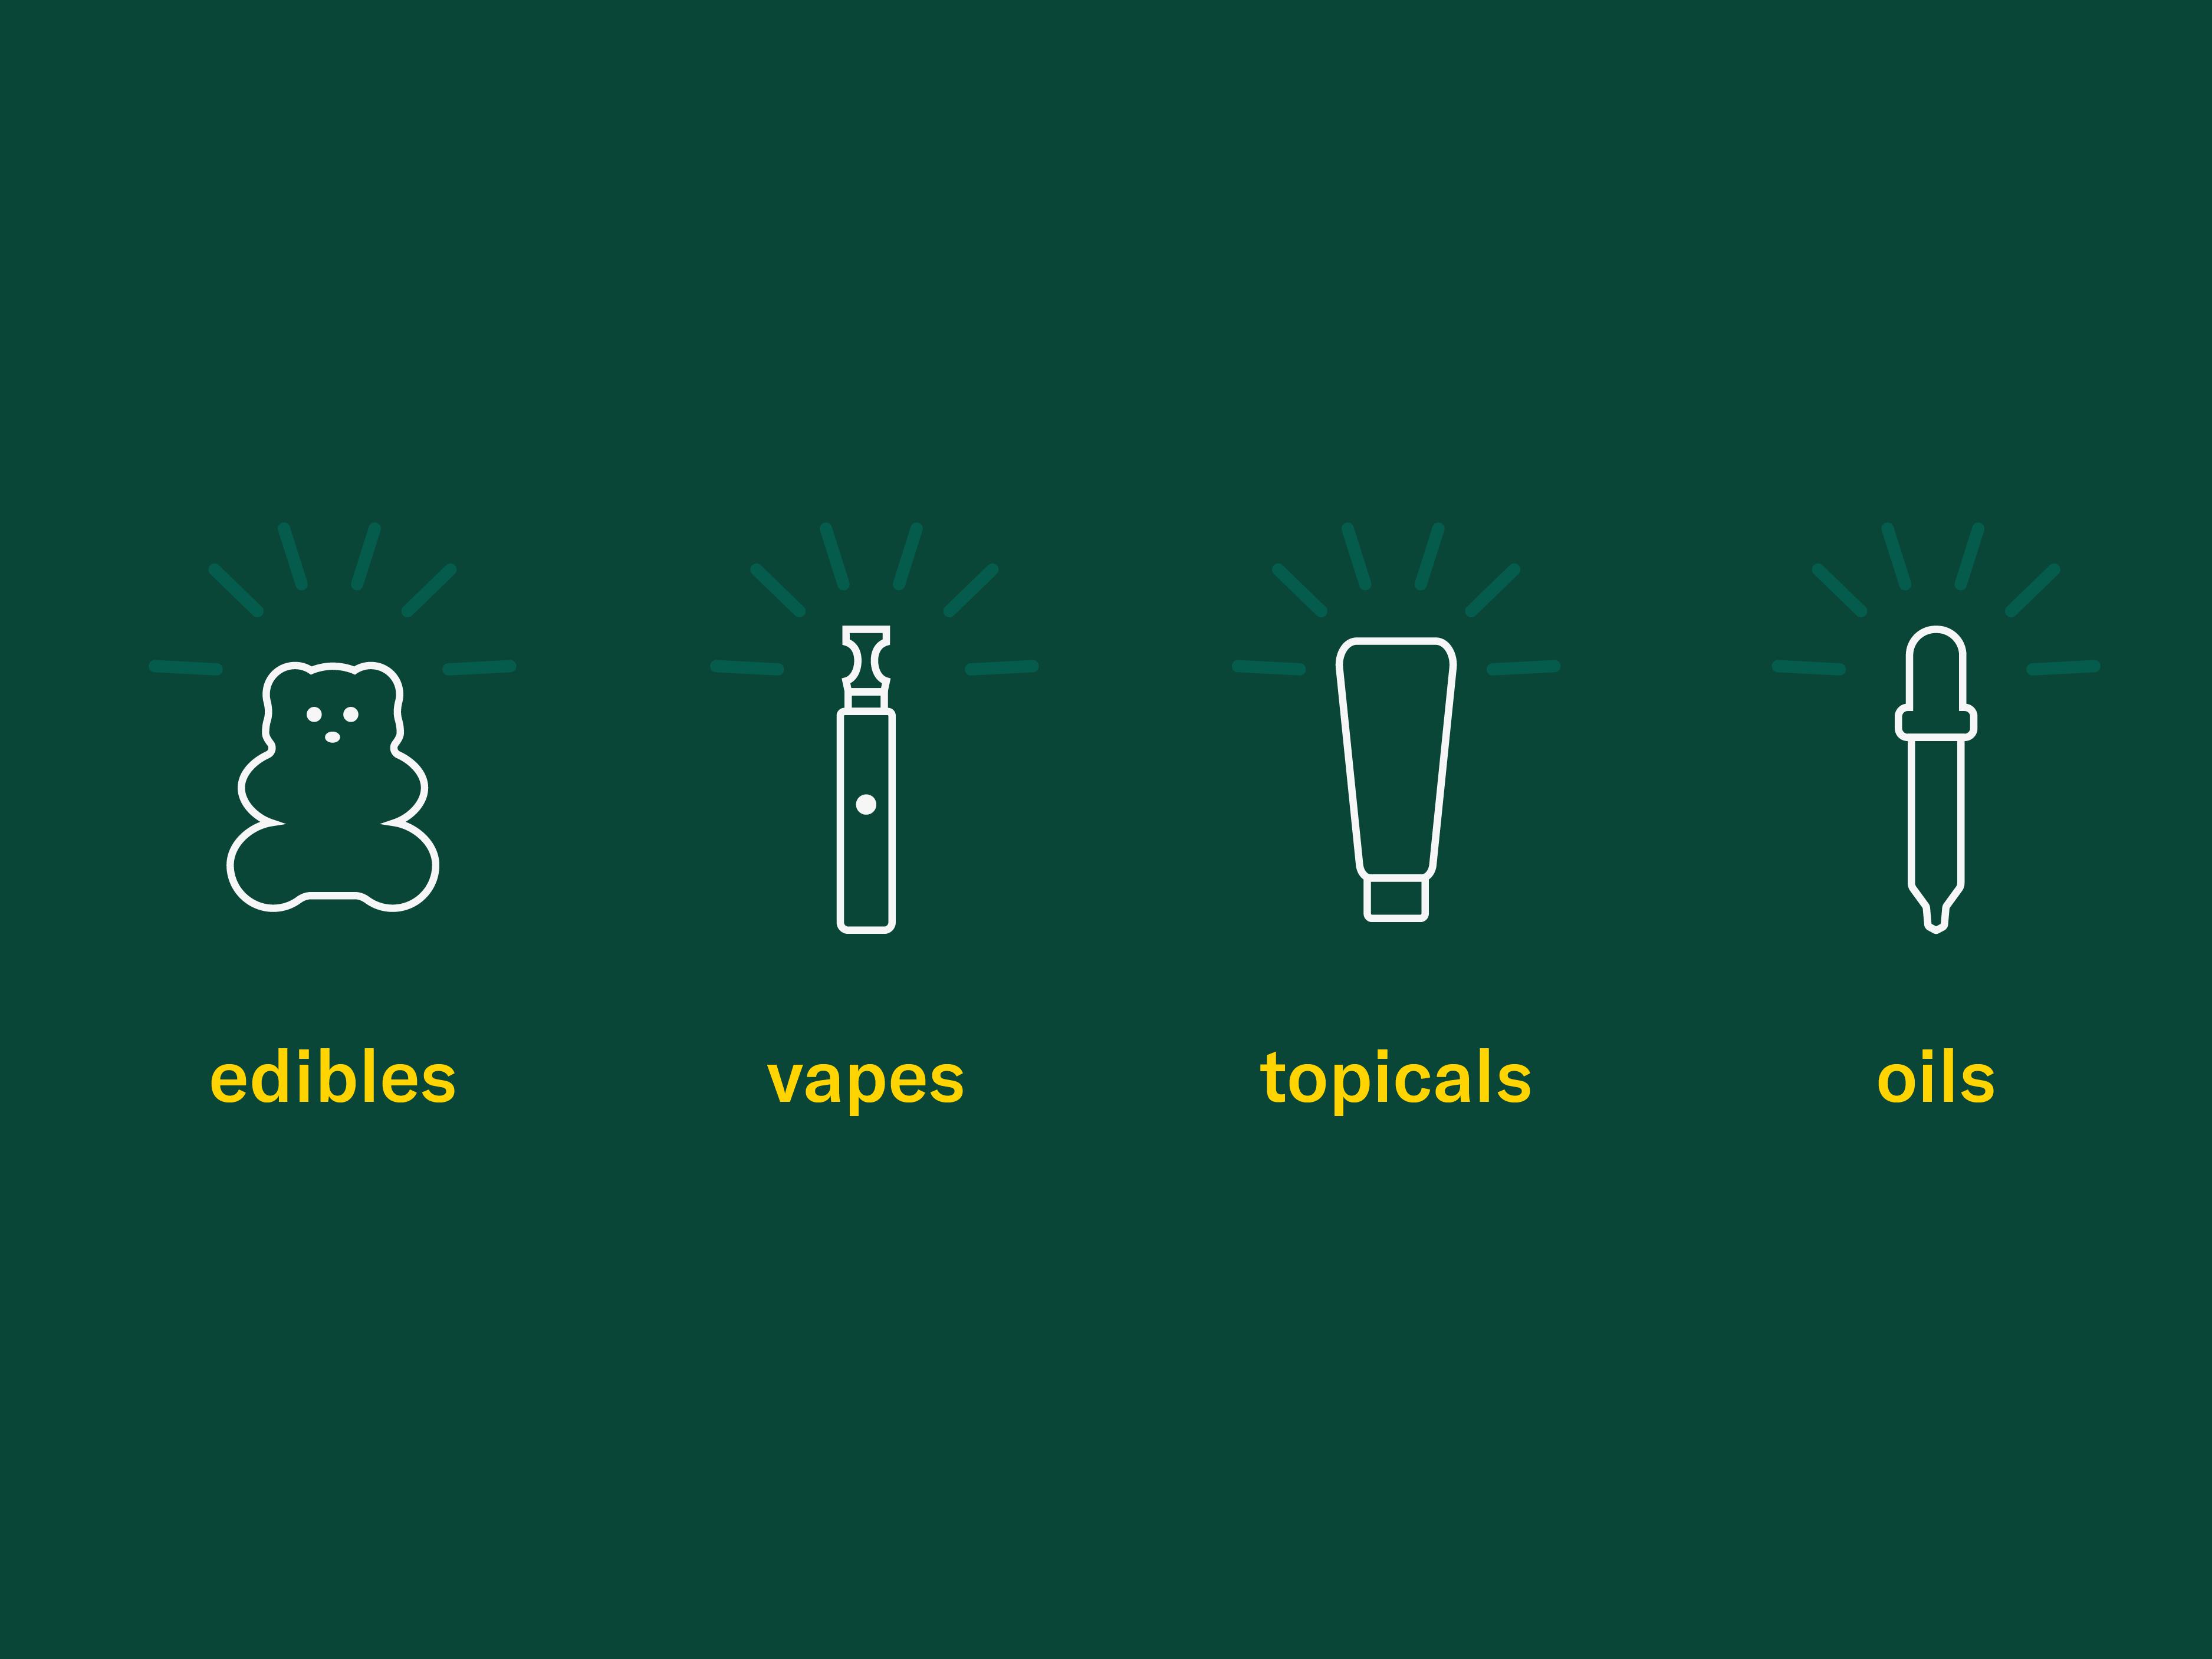 CBD oils and CBD products